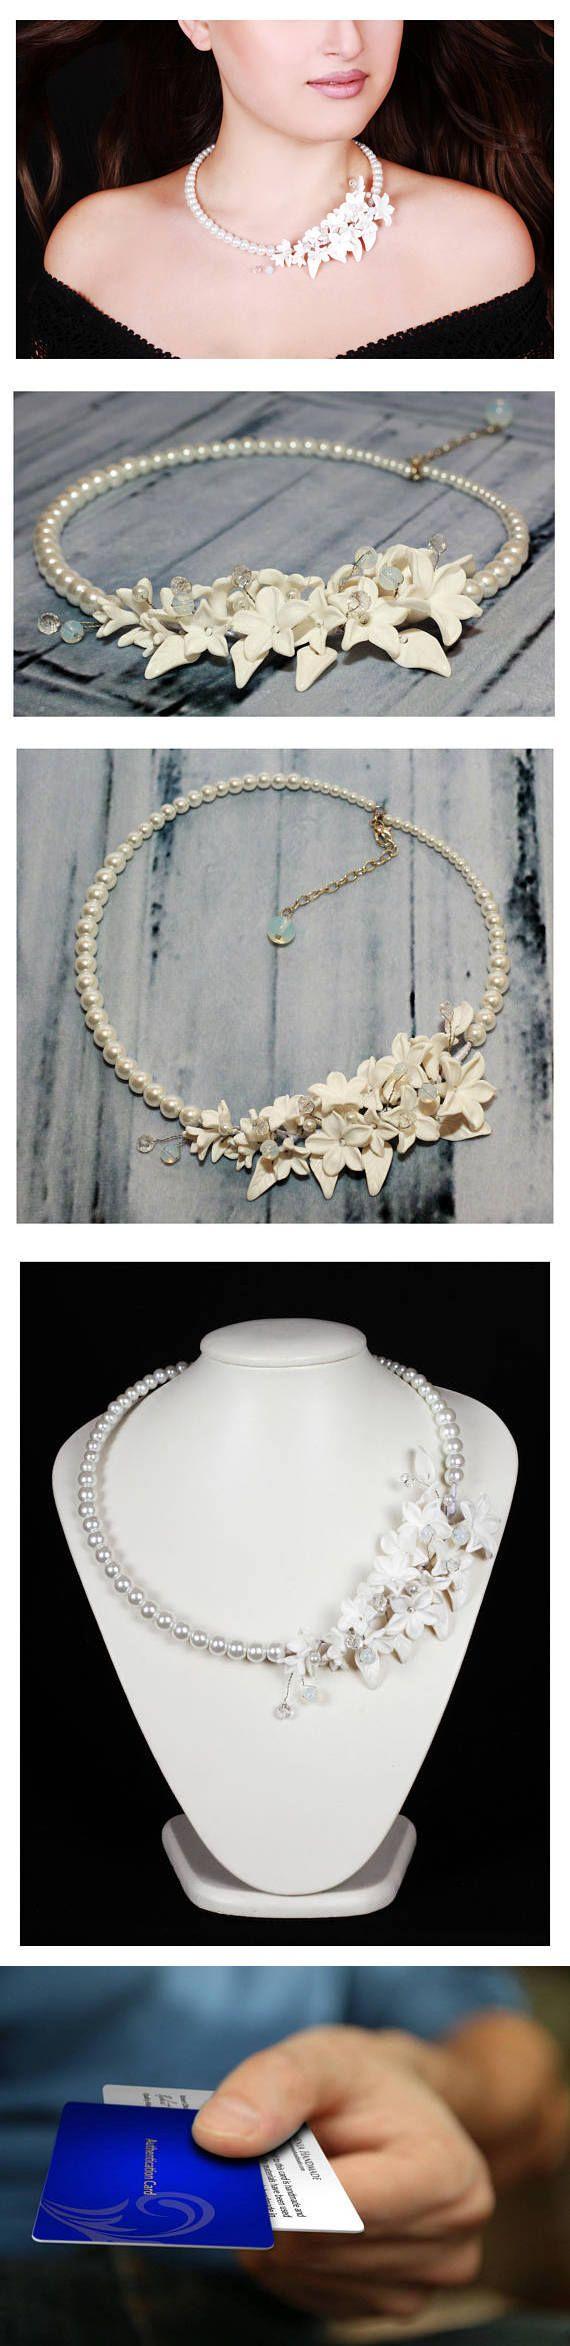 Bridal Stephanotis Wedding Flowers Necklace - Bride Necklace - Stephanotis Necklace - Jasmine Necklace - Wedding Jewelry- Bridal Gift https://www.etsy.com/listing/553485721/bridal-stephanotis-wedding-flowers?share_time=1516976318000&utm_term=so.slt&utm_content=bufferfc157&utm_medium=social&utm_source=pinterest.com&utm_campaign=buffer #armeniangift #valentinesday #mothersday #armenian #armenia #handmade #bridalgift #wedding #jewelry #weddingpresent #bride #stephanotis #brideshower